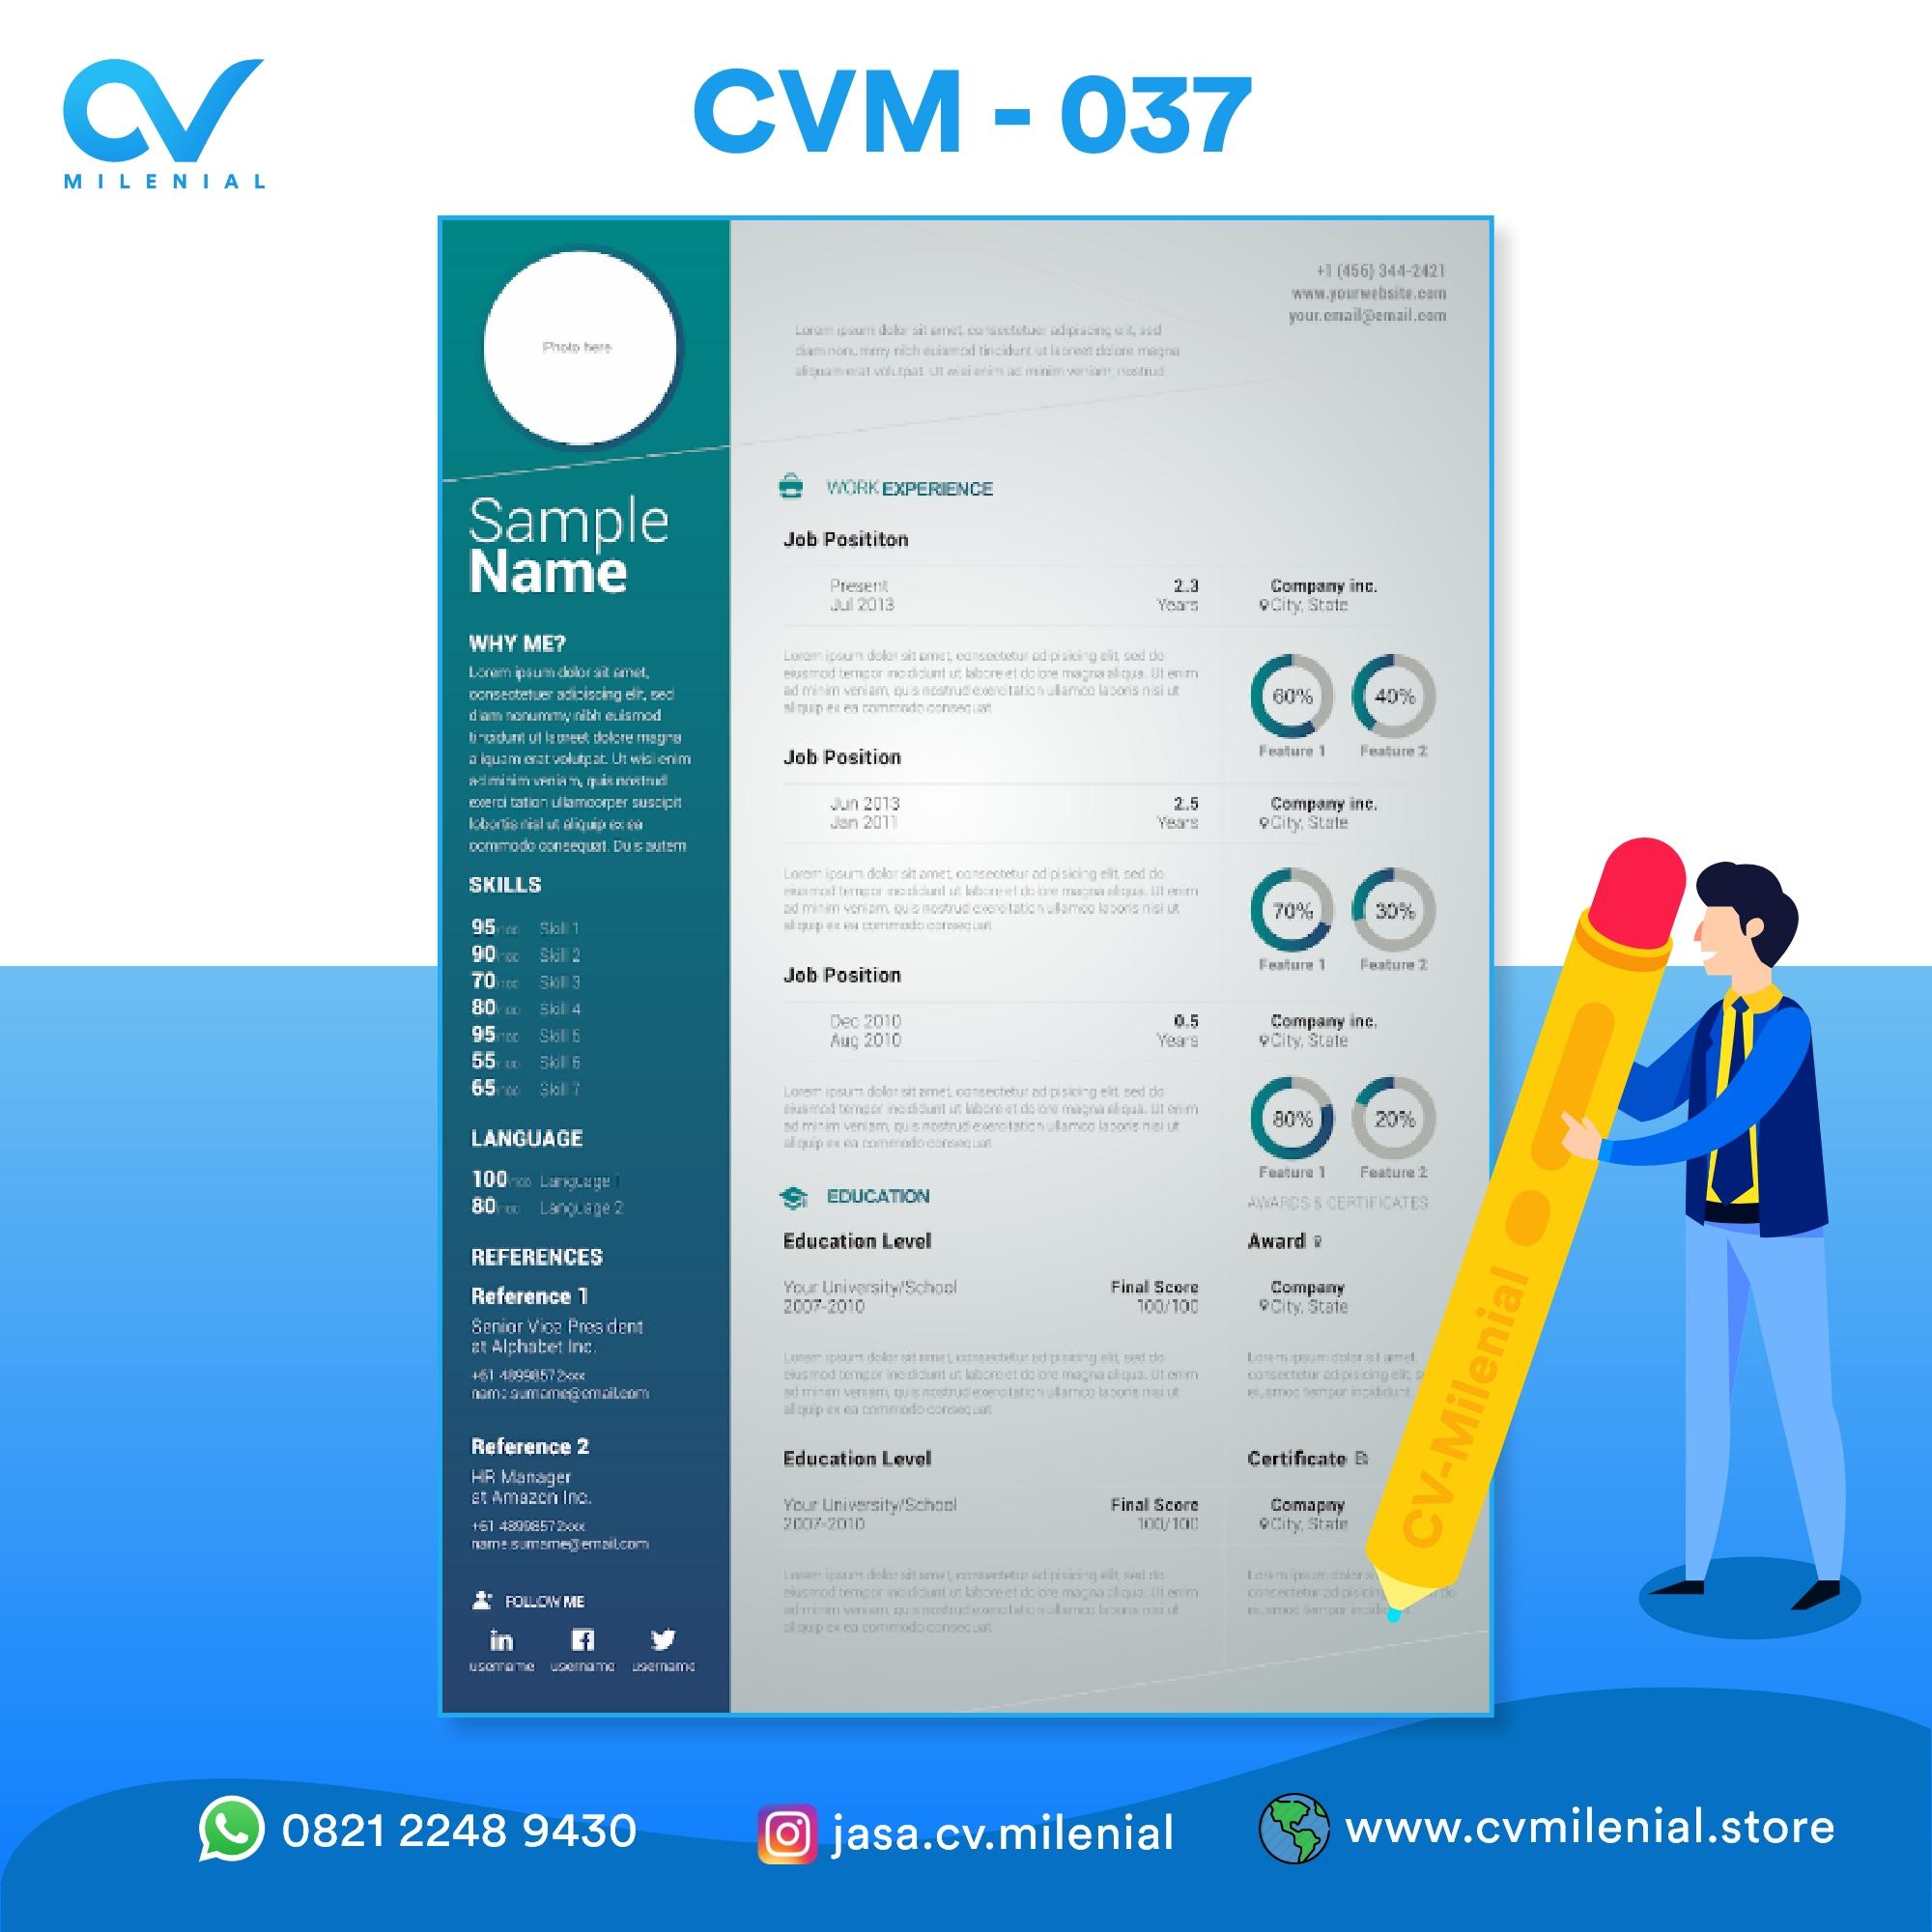 https://cvmilenial.com/assets/image/desain_cv/37.jpg